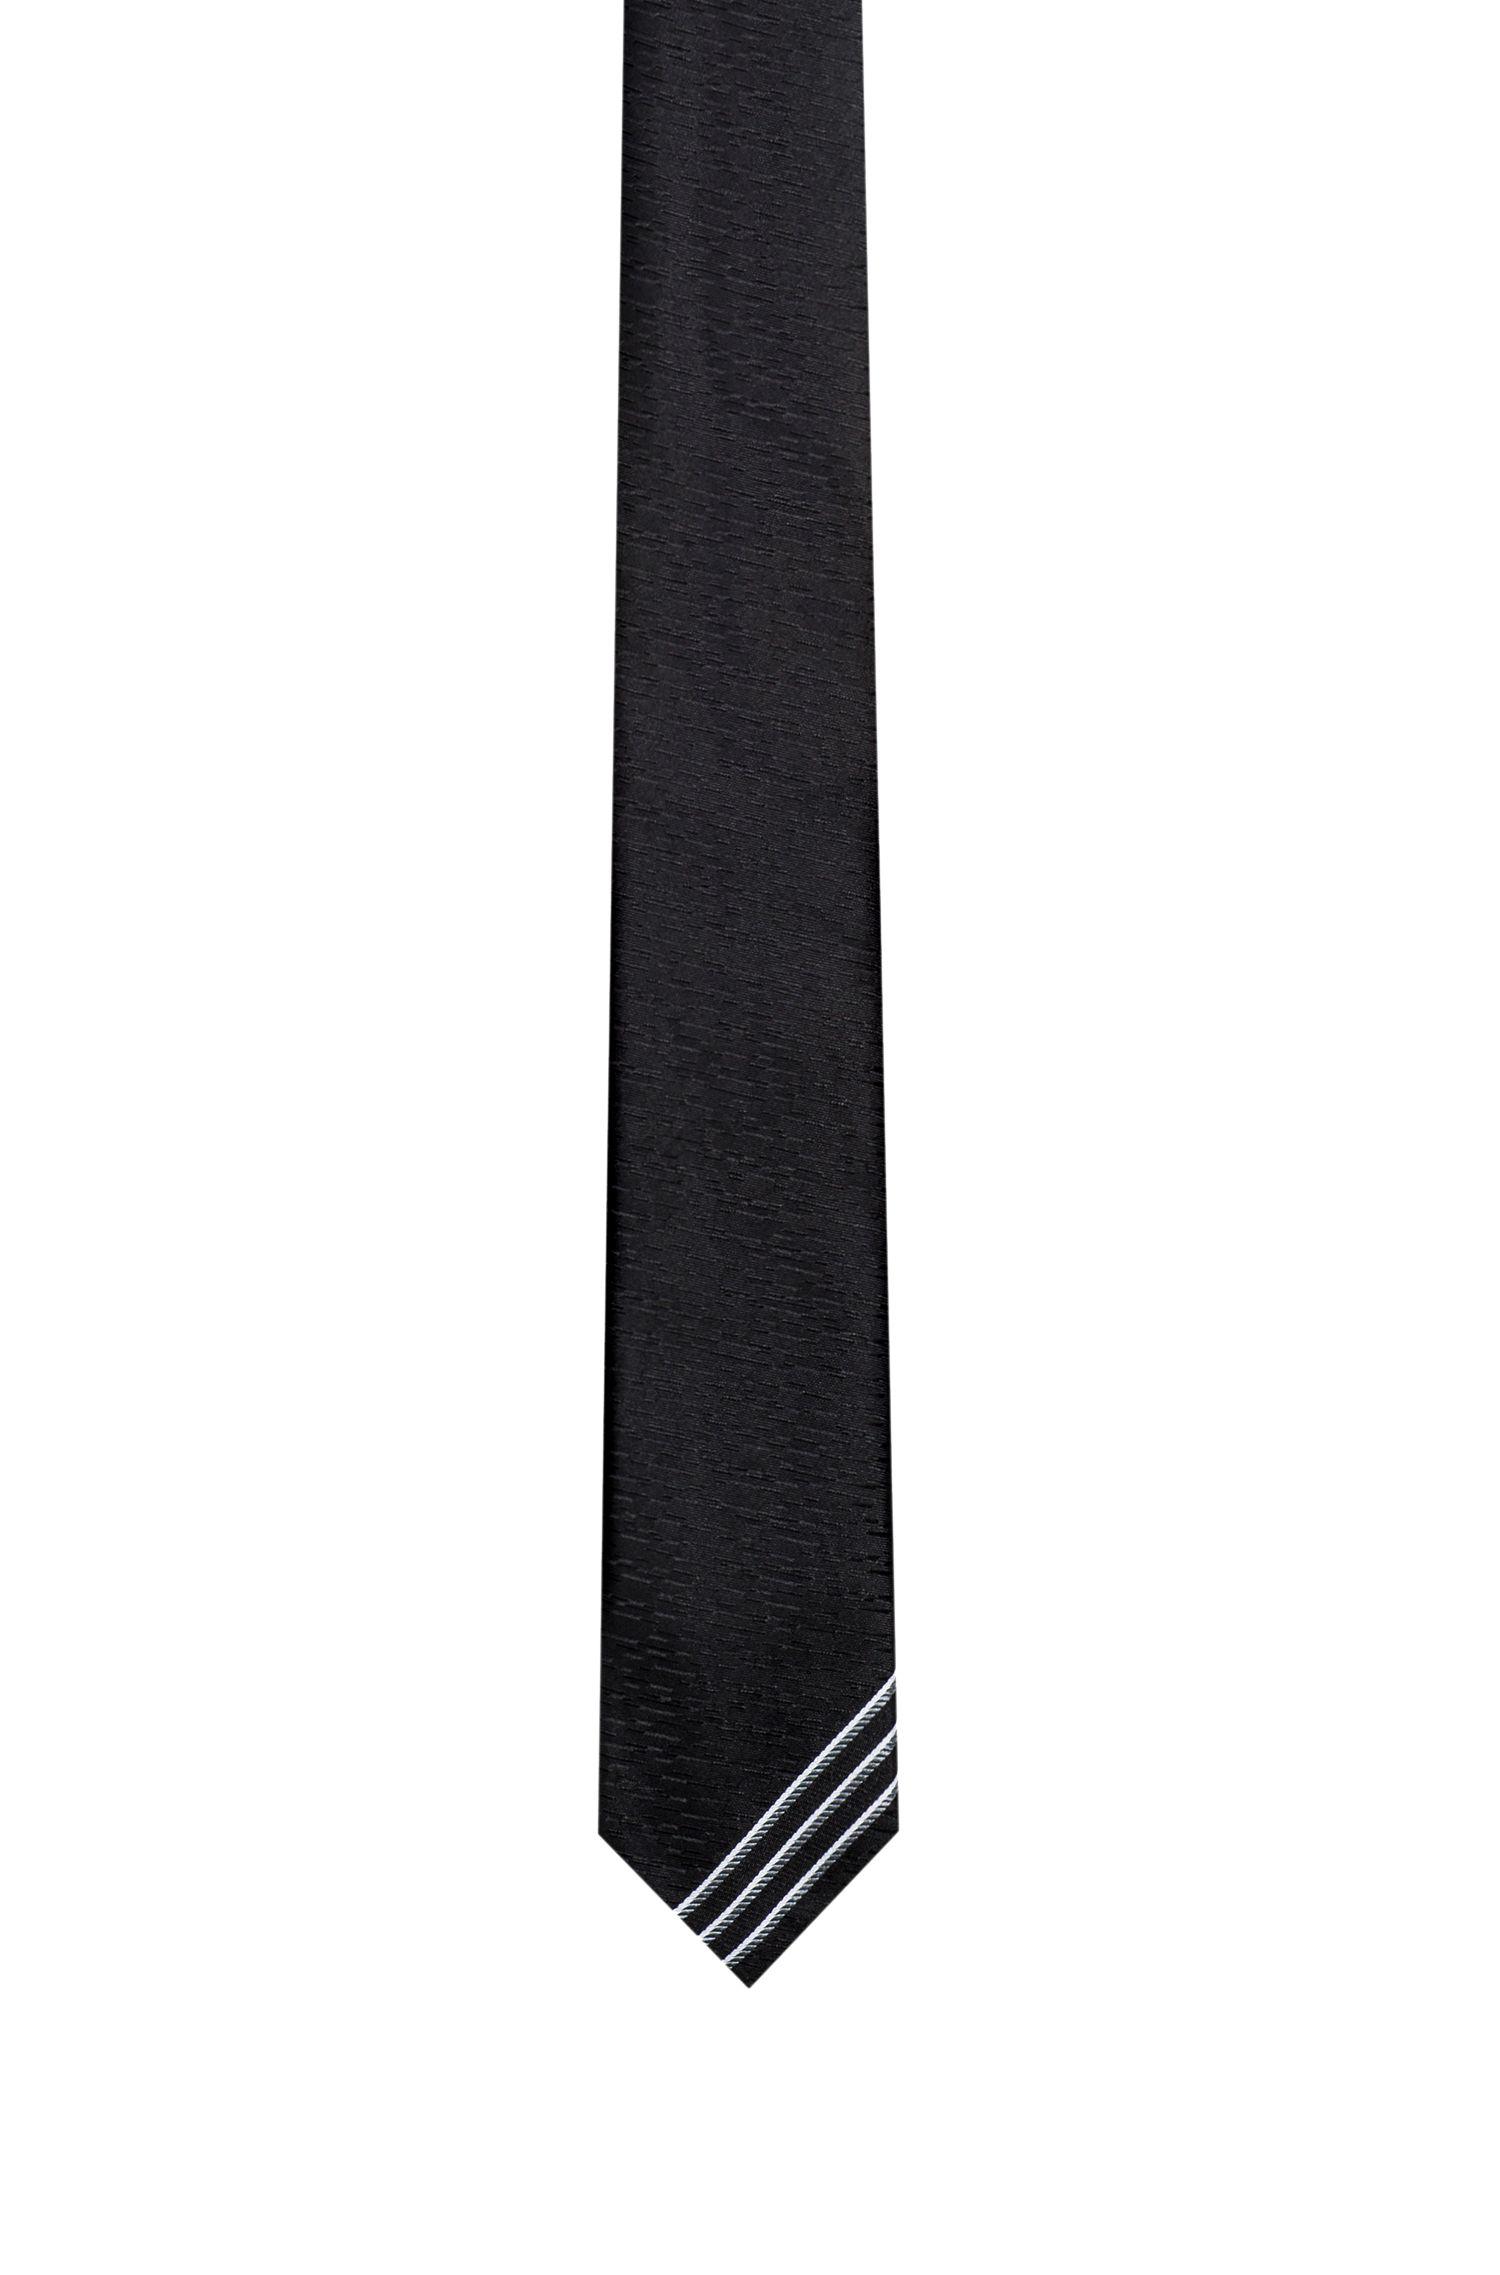 Krawatte aus Seiden-Jacquard mit gestreifter Spitze